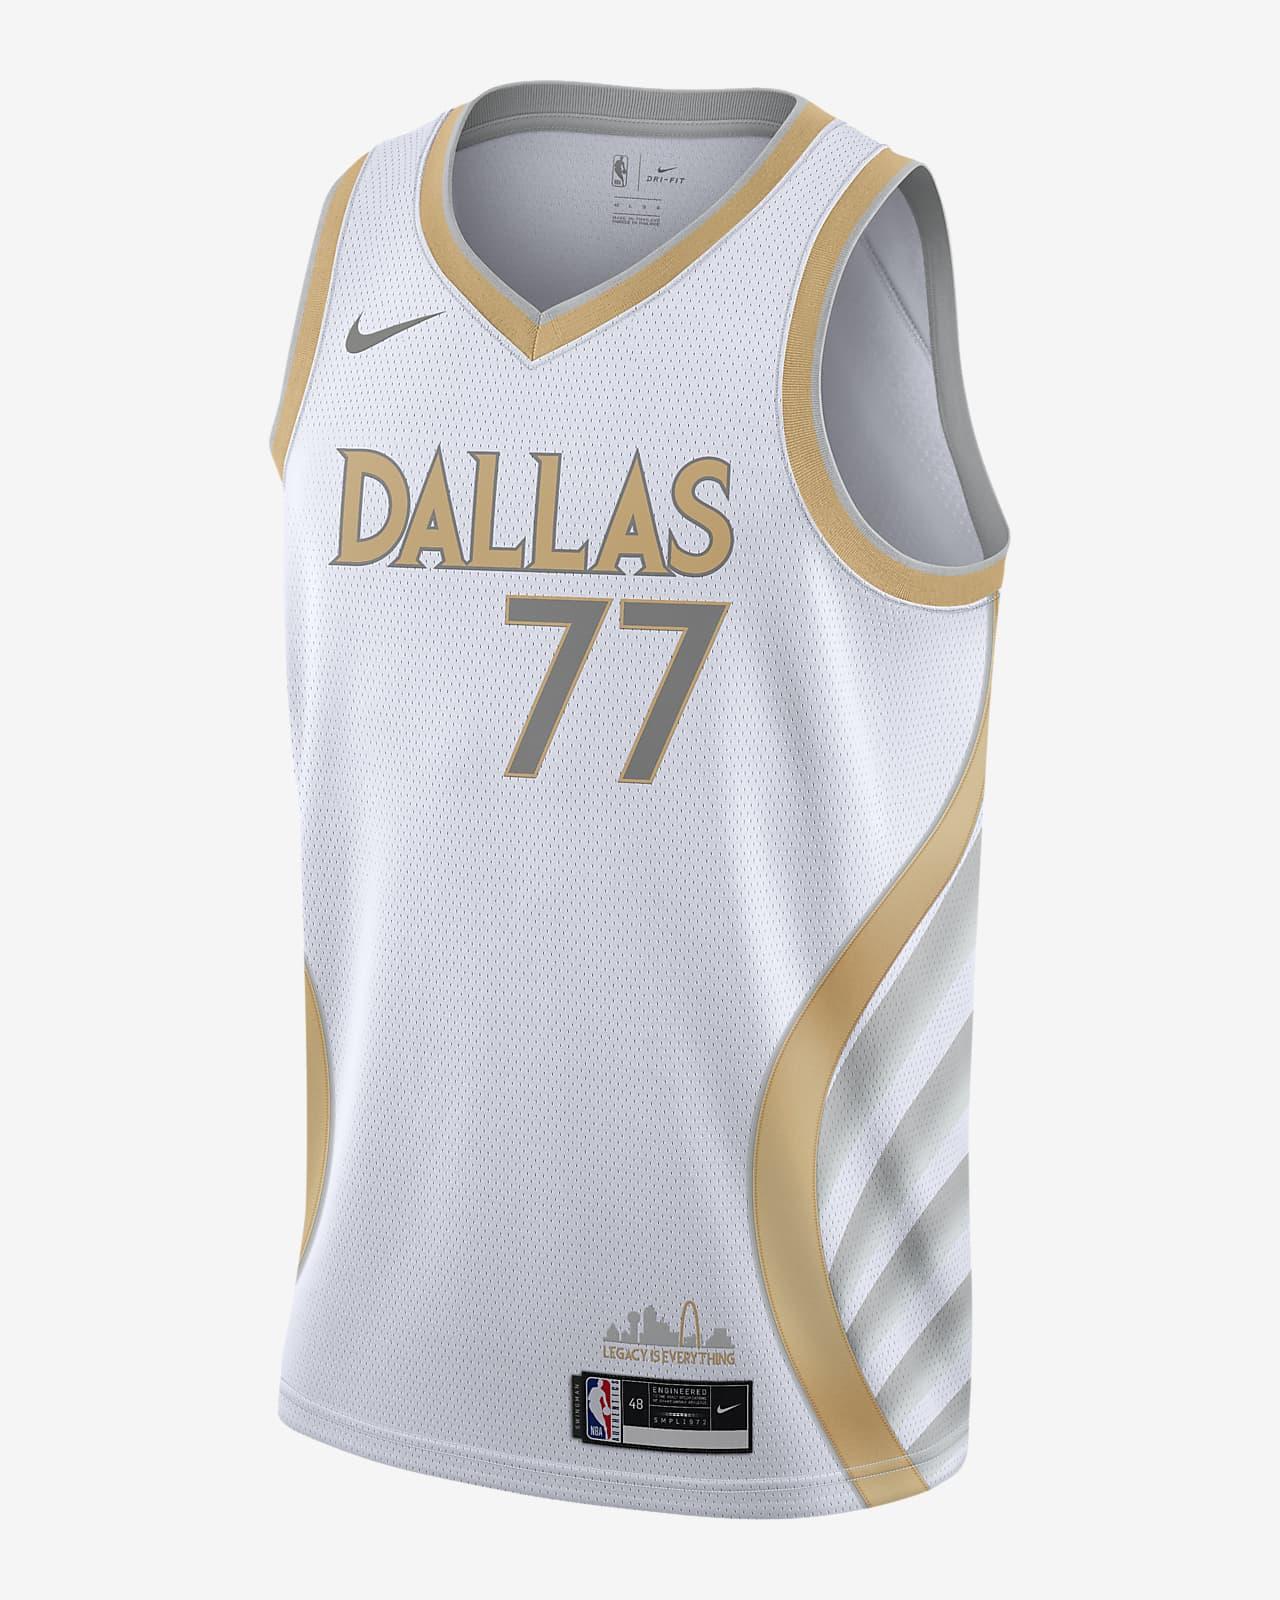 Maillot Nike NBA Swingman Dallas Mavericks City Edition